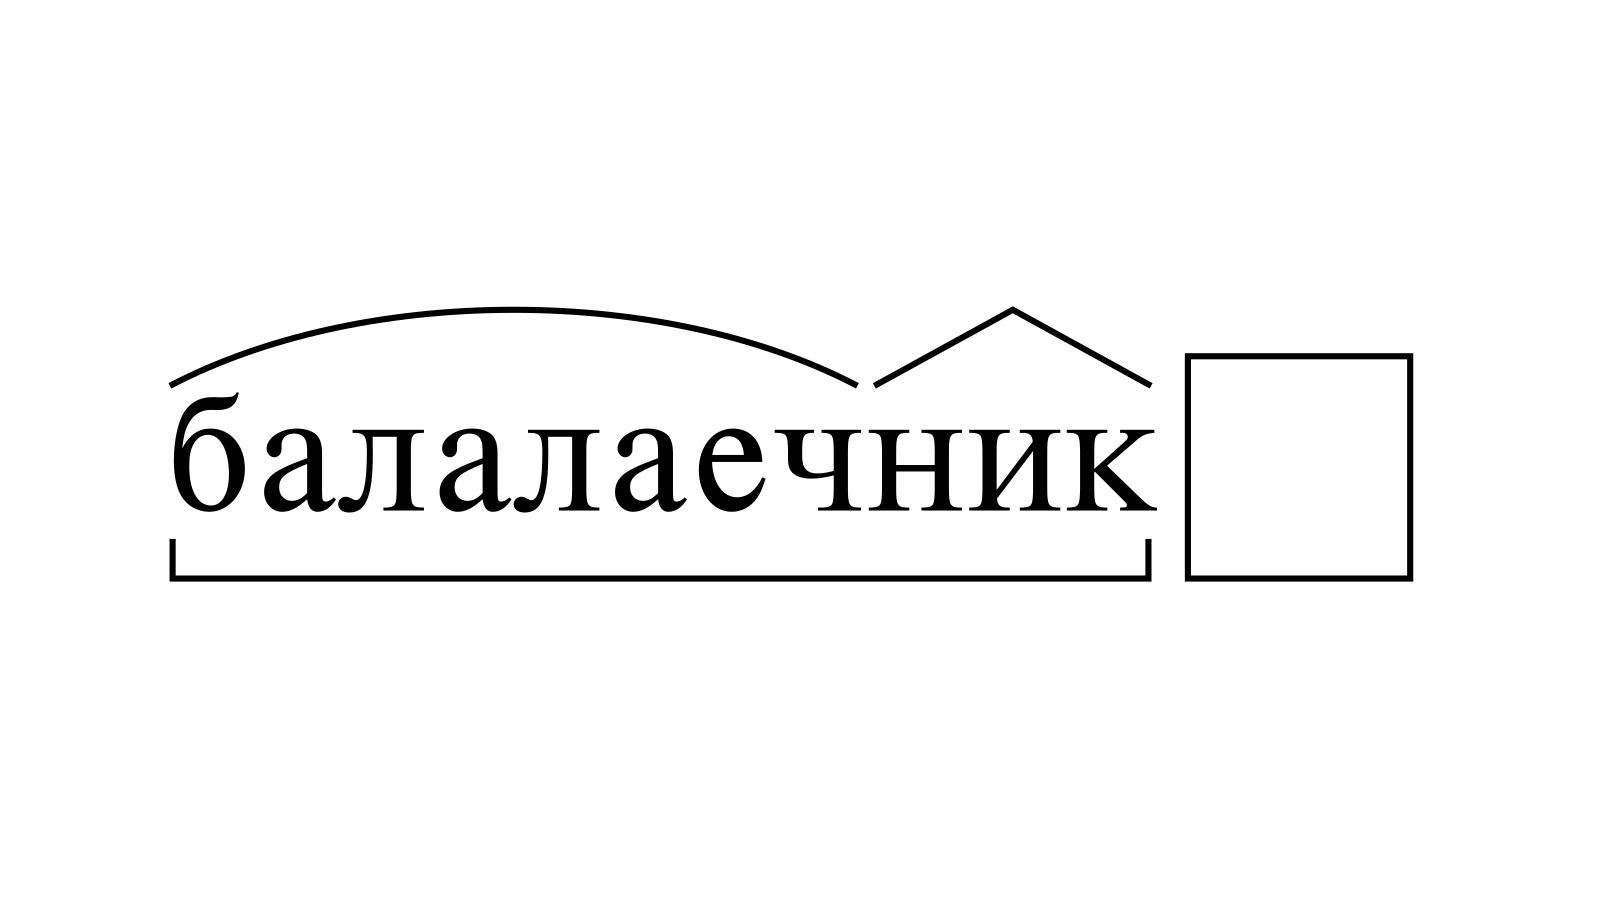 Разбор слова «балалаечник» по составу